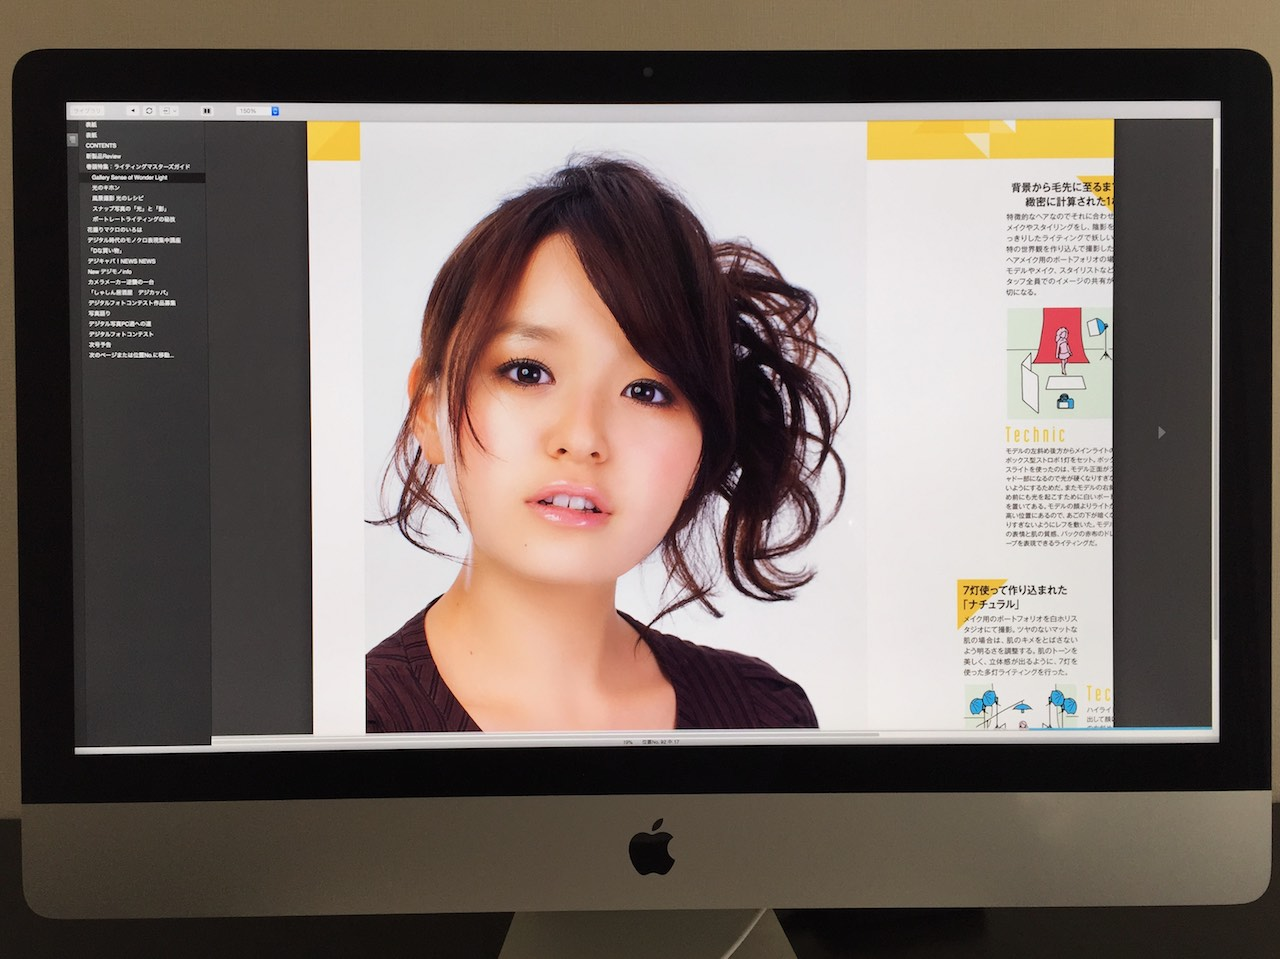 iMac Retina 5Kディスプレイモデルで読むKindle for Macがヤバい